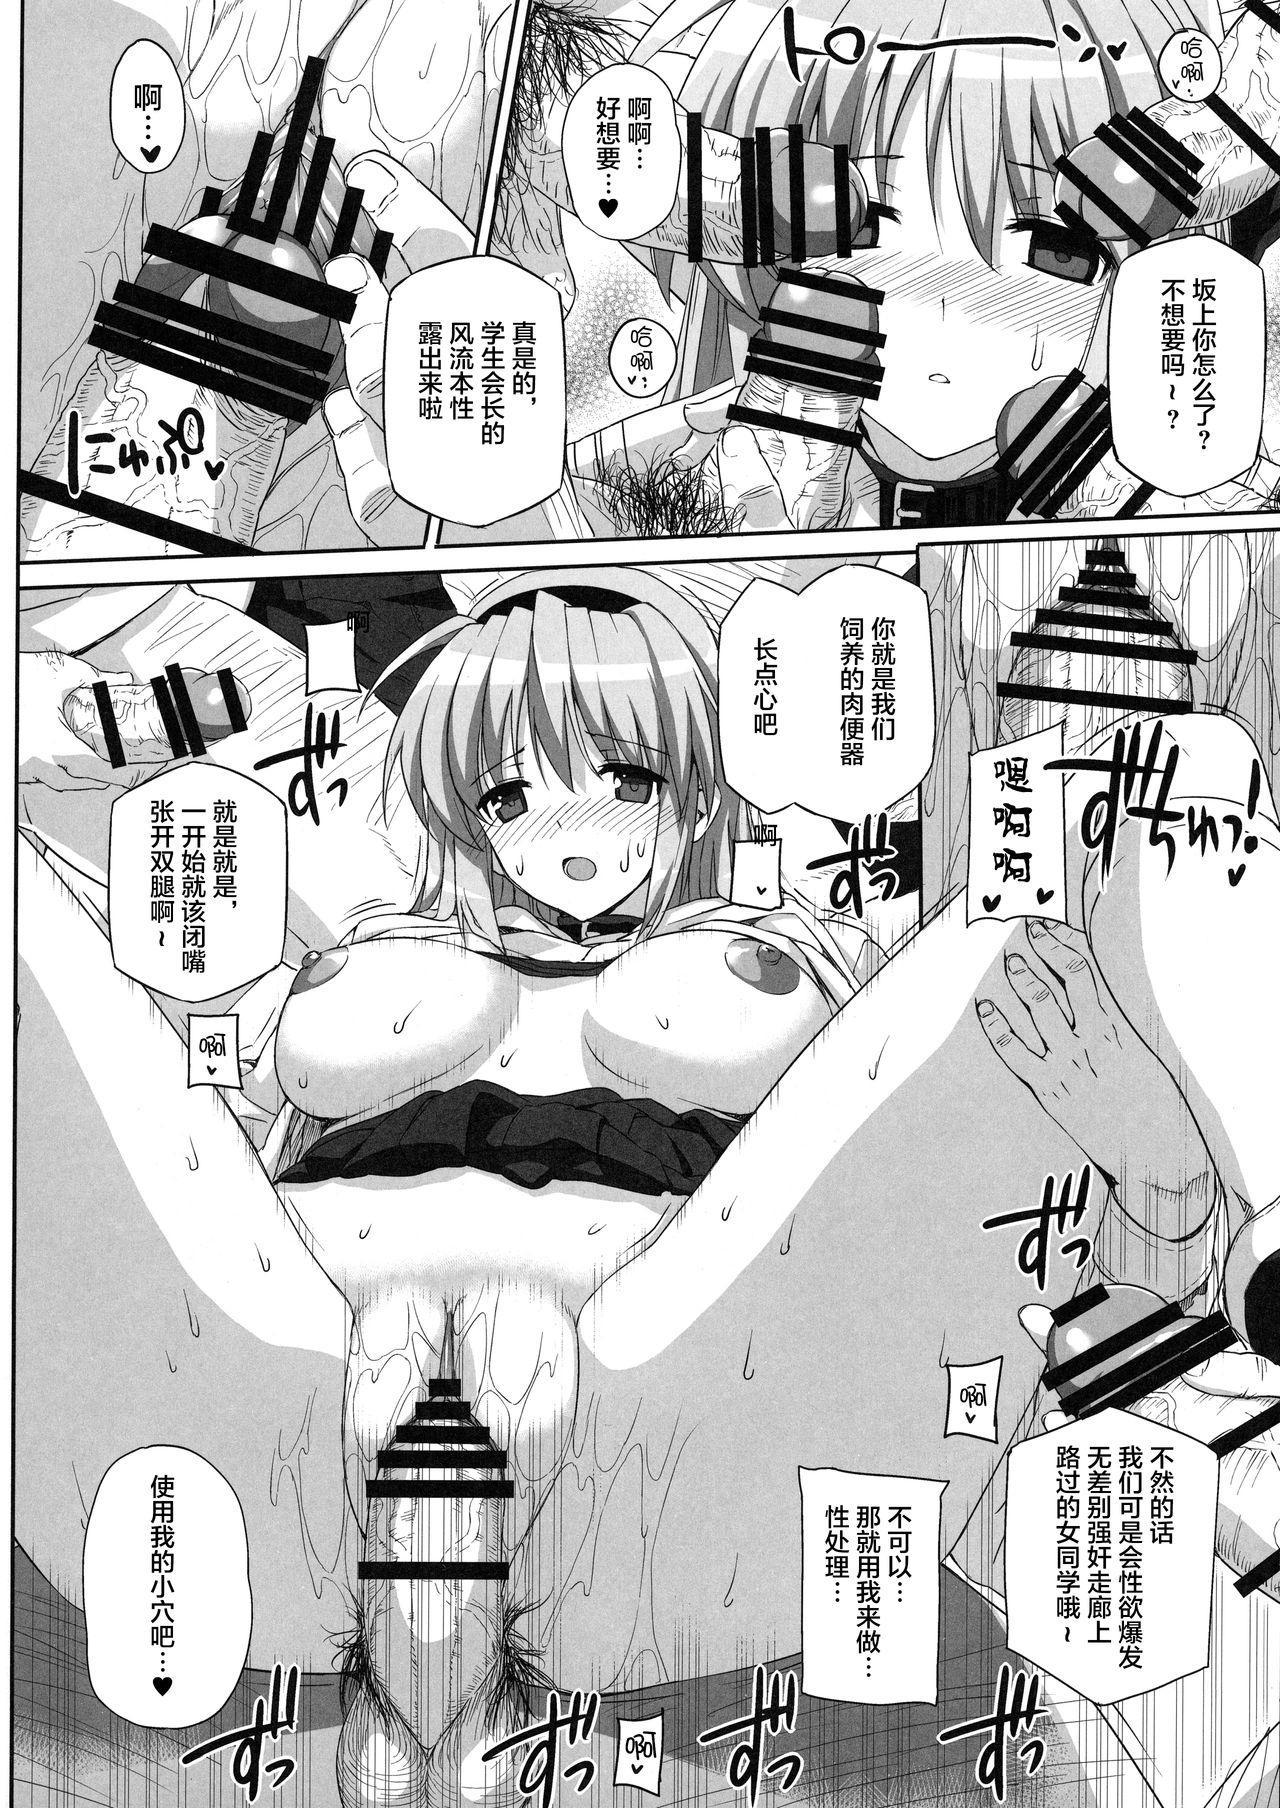 Basutei Shower Soushuuhen MANIA COLLECTION 02 10